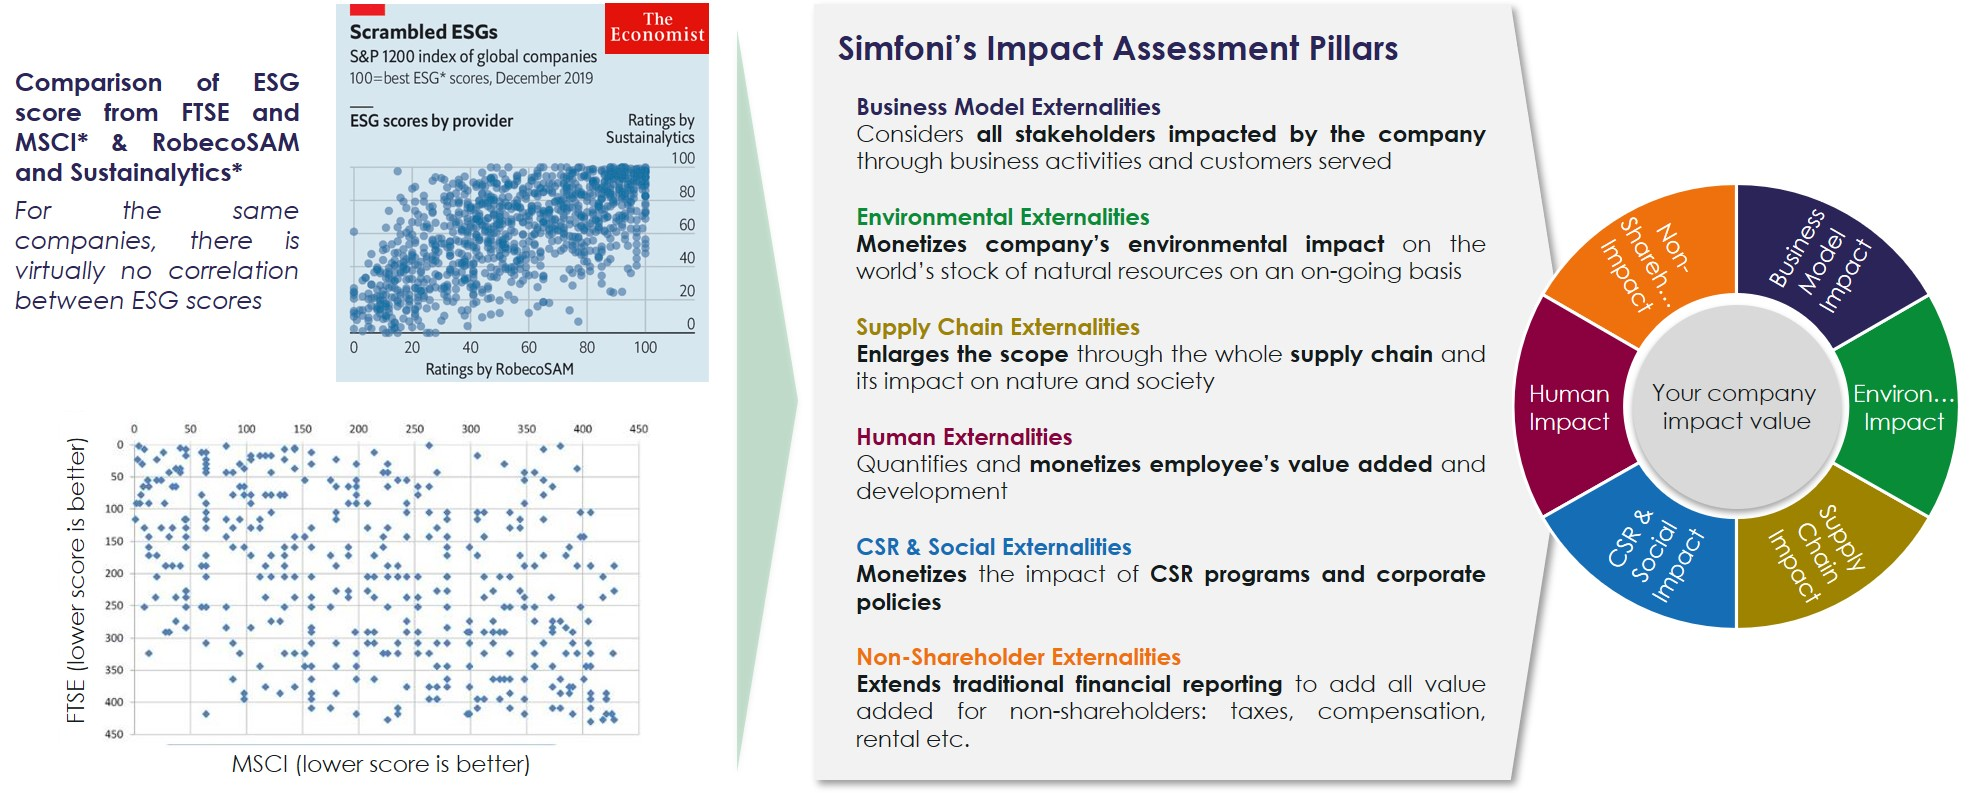 Simfoni's Impact Assessment